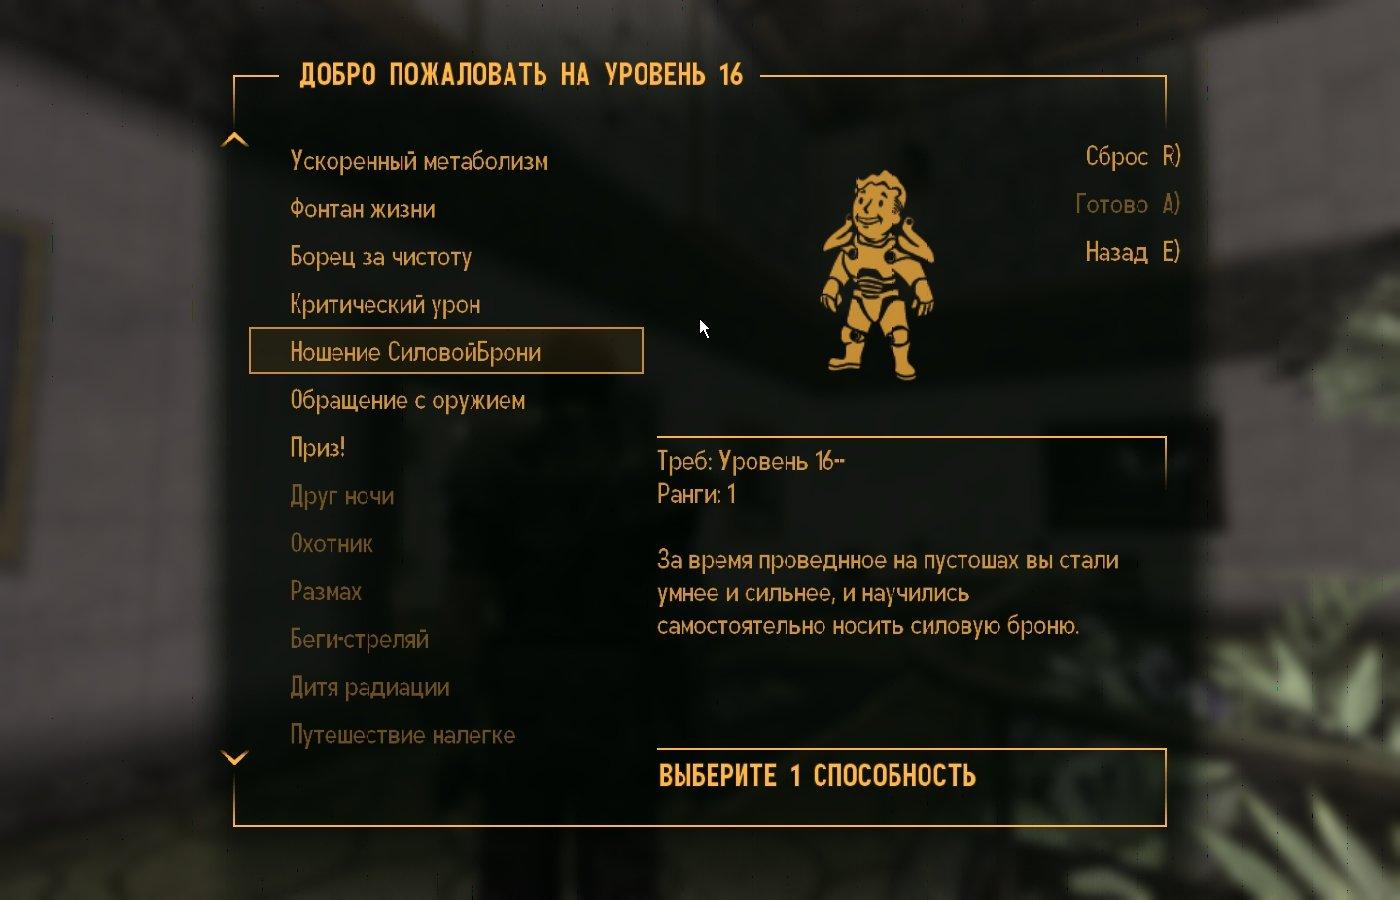 Fallout 3 чит на ношение силовой брони